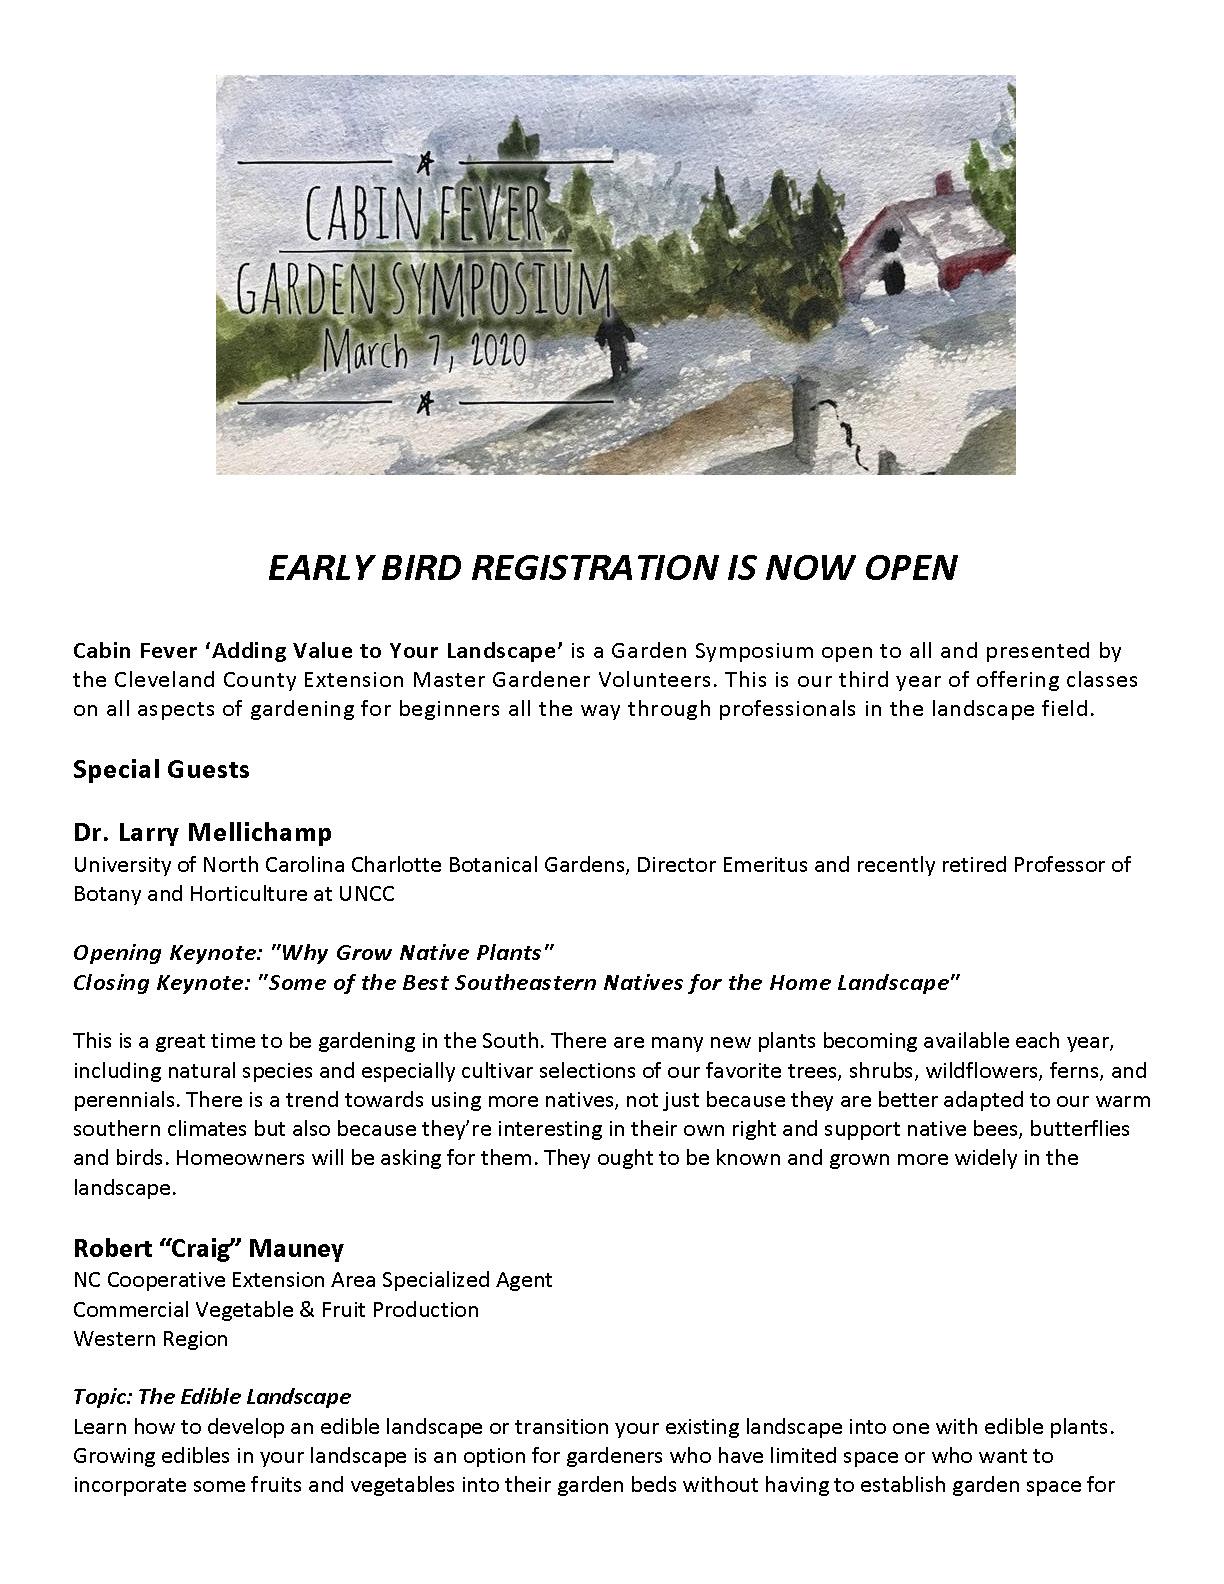 Cabin Fever Garden Symposium flyer